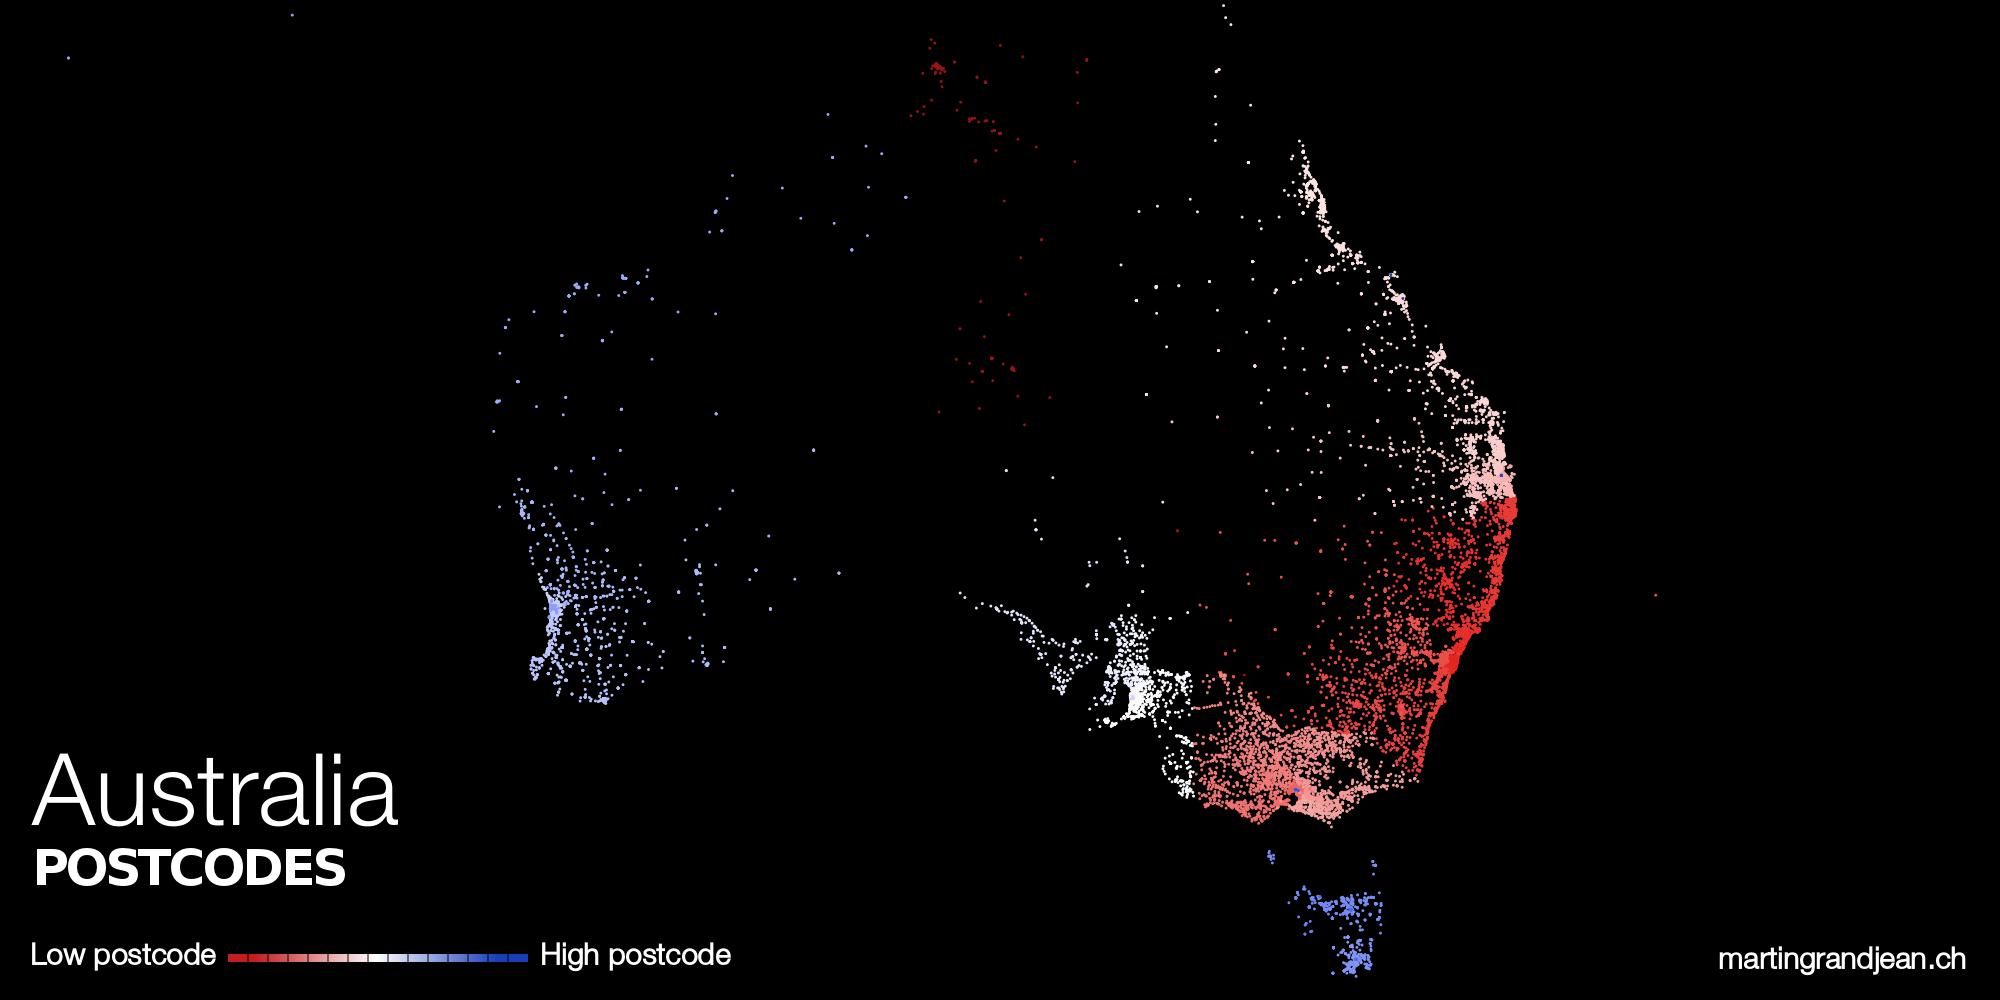 Australia postcodes mapping